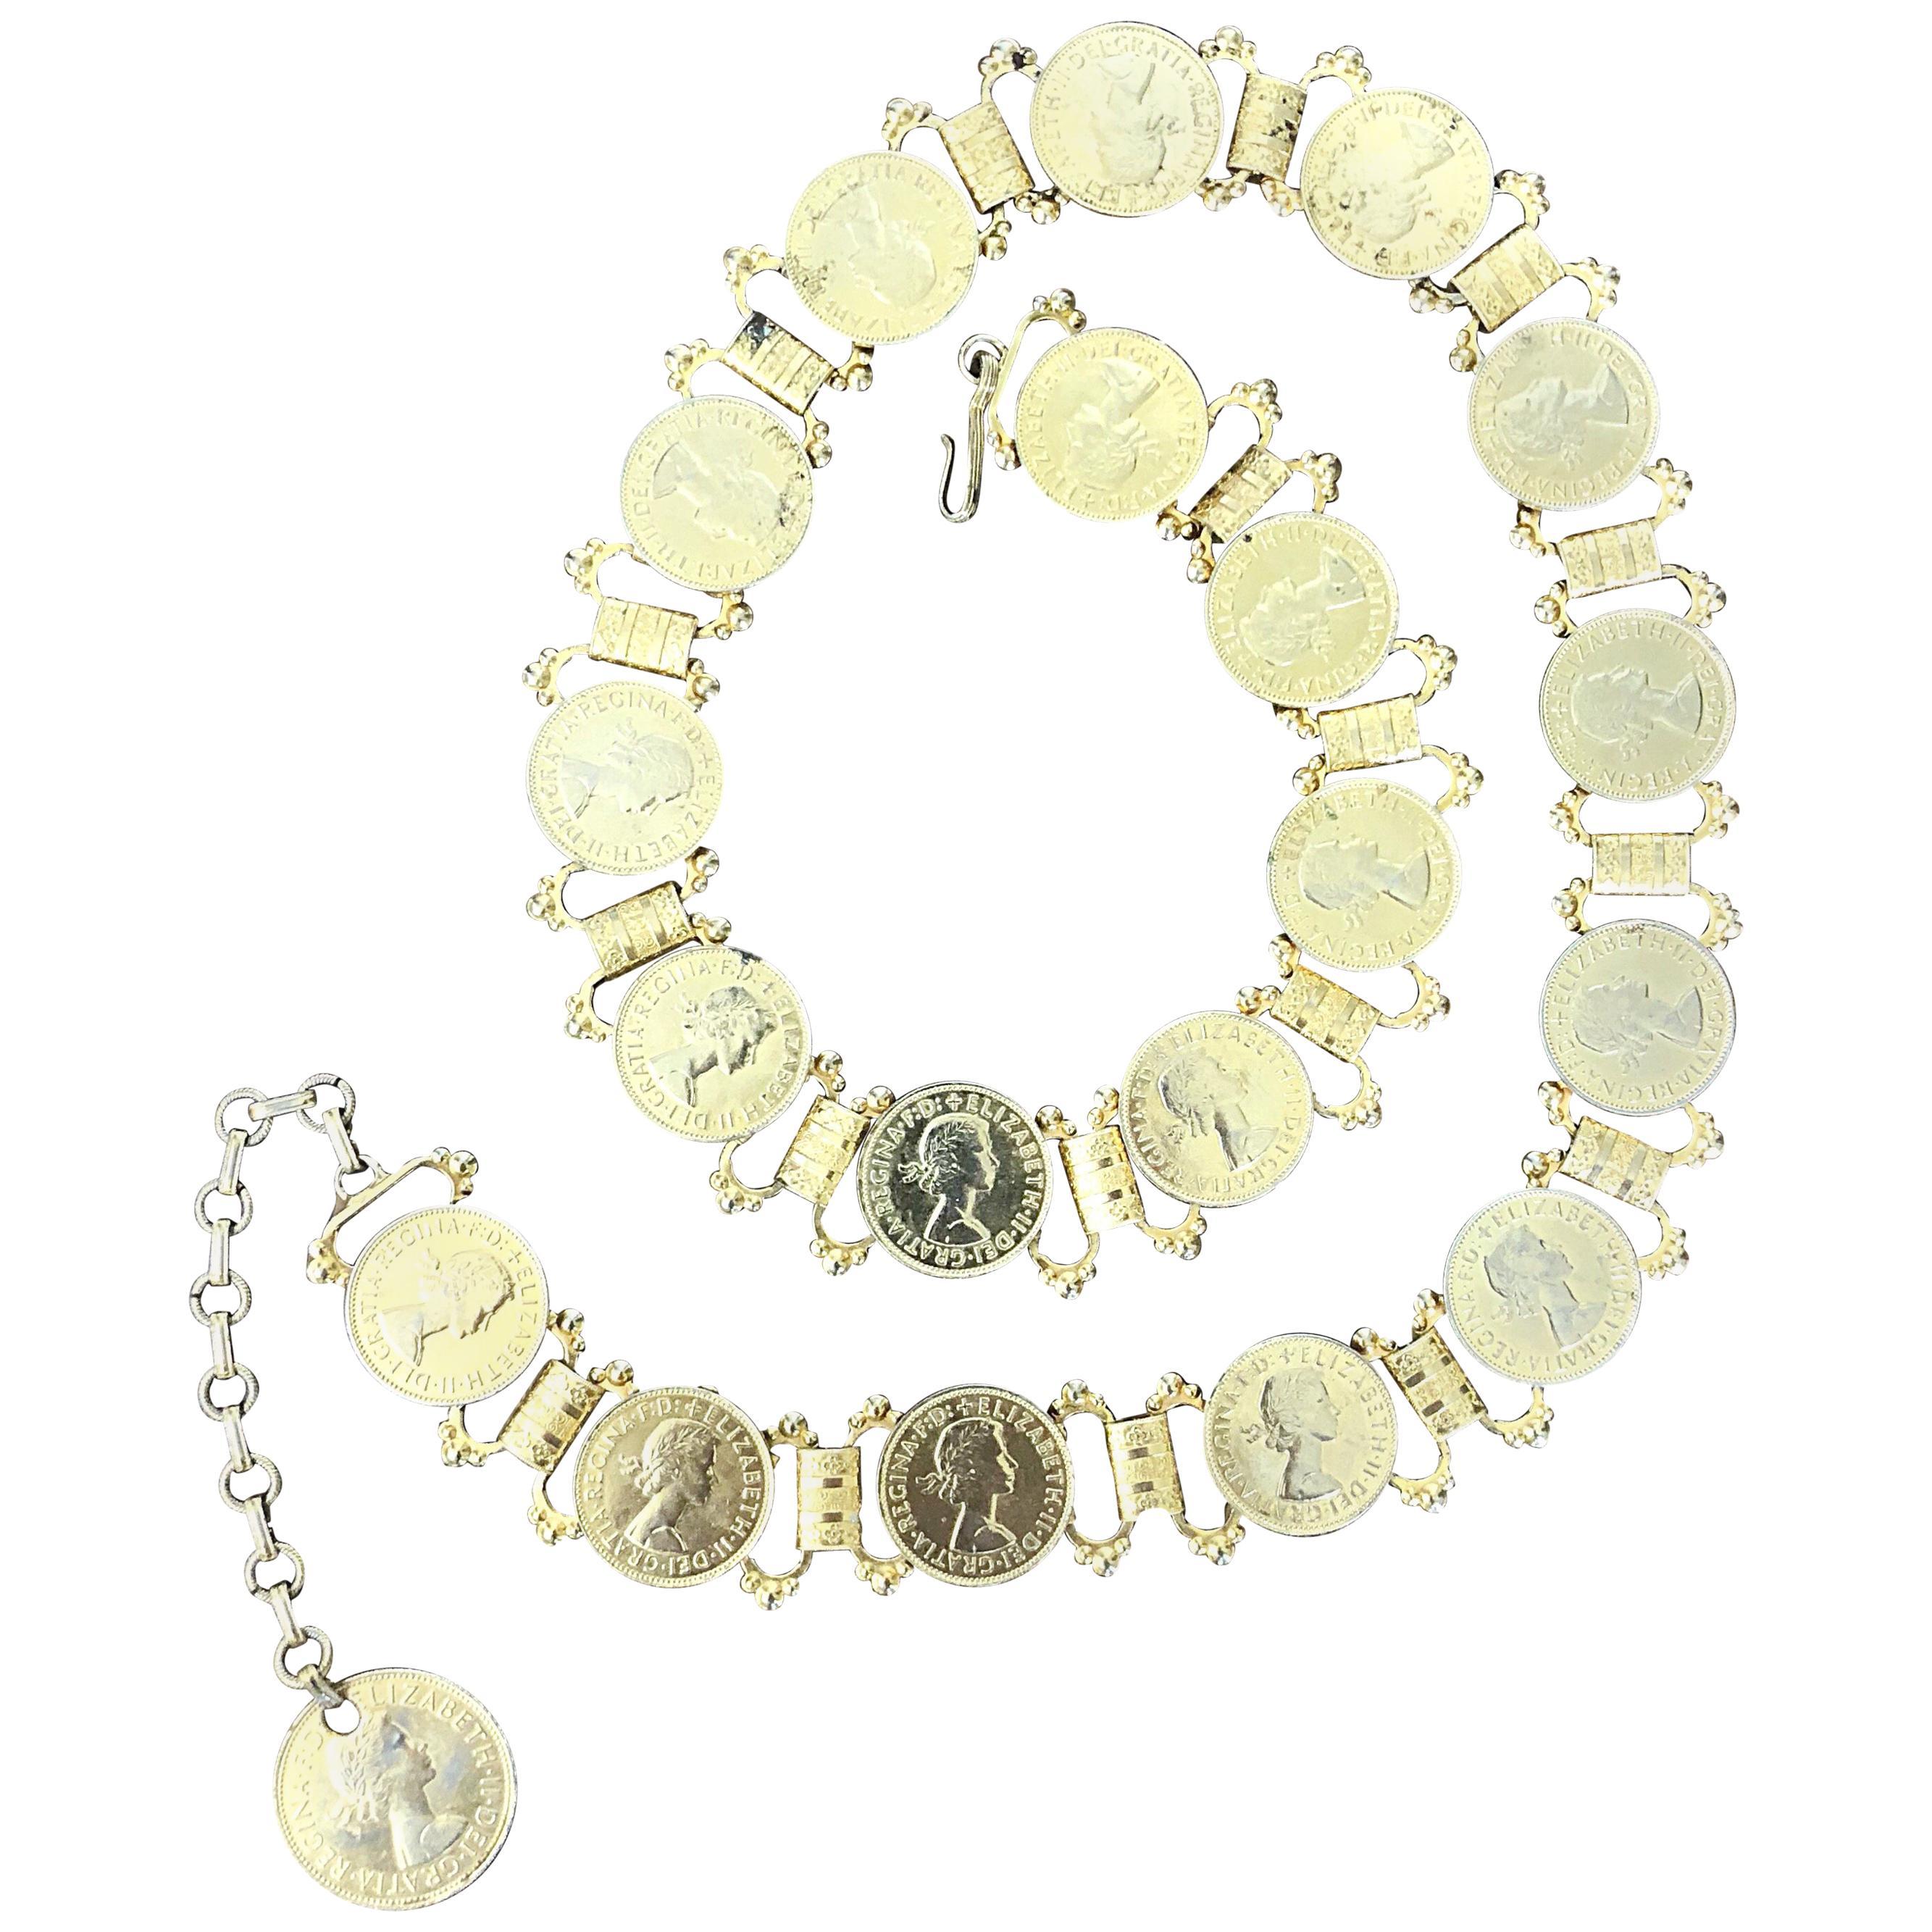 Elizabeth Dei Gratia 1960s Gold Coin Vintage 60s Novelty Chain Belt or Necklace